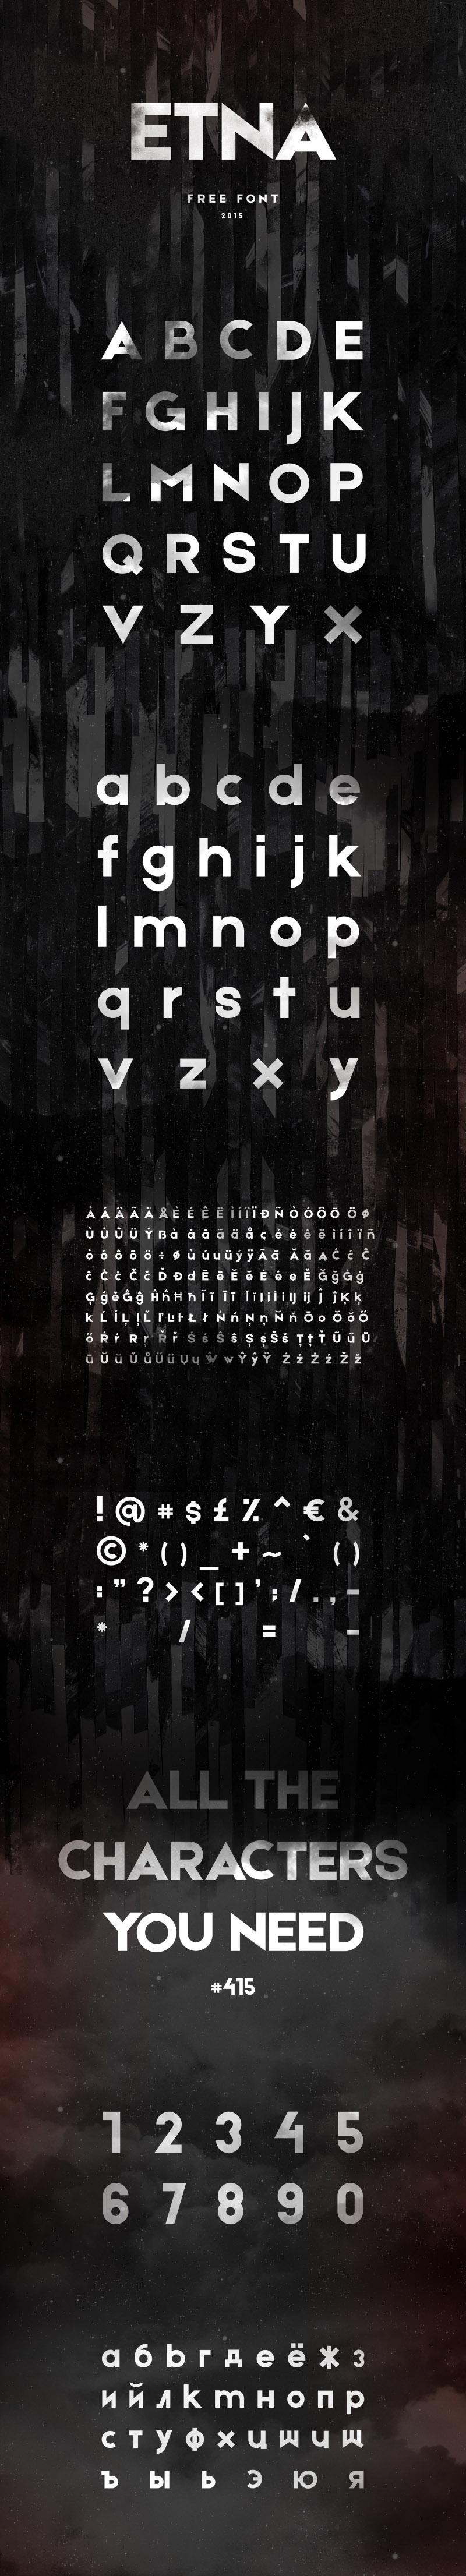 ETNA Free Font - WILDTYPE